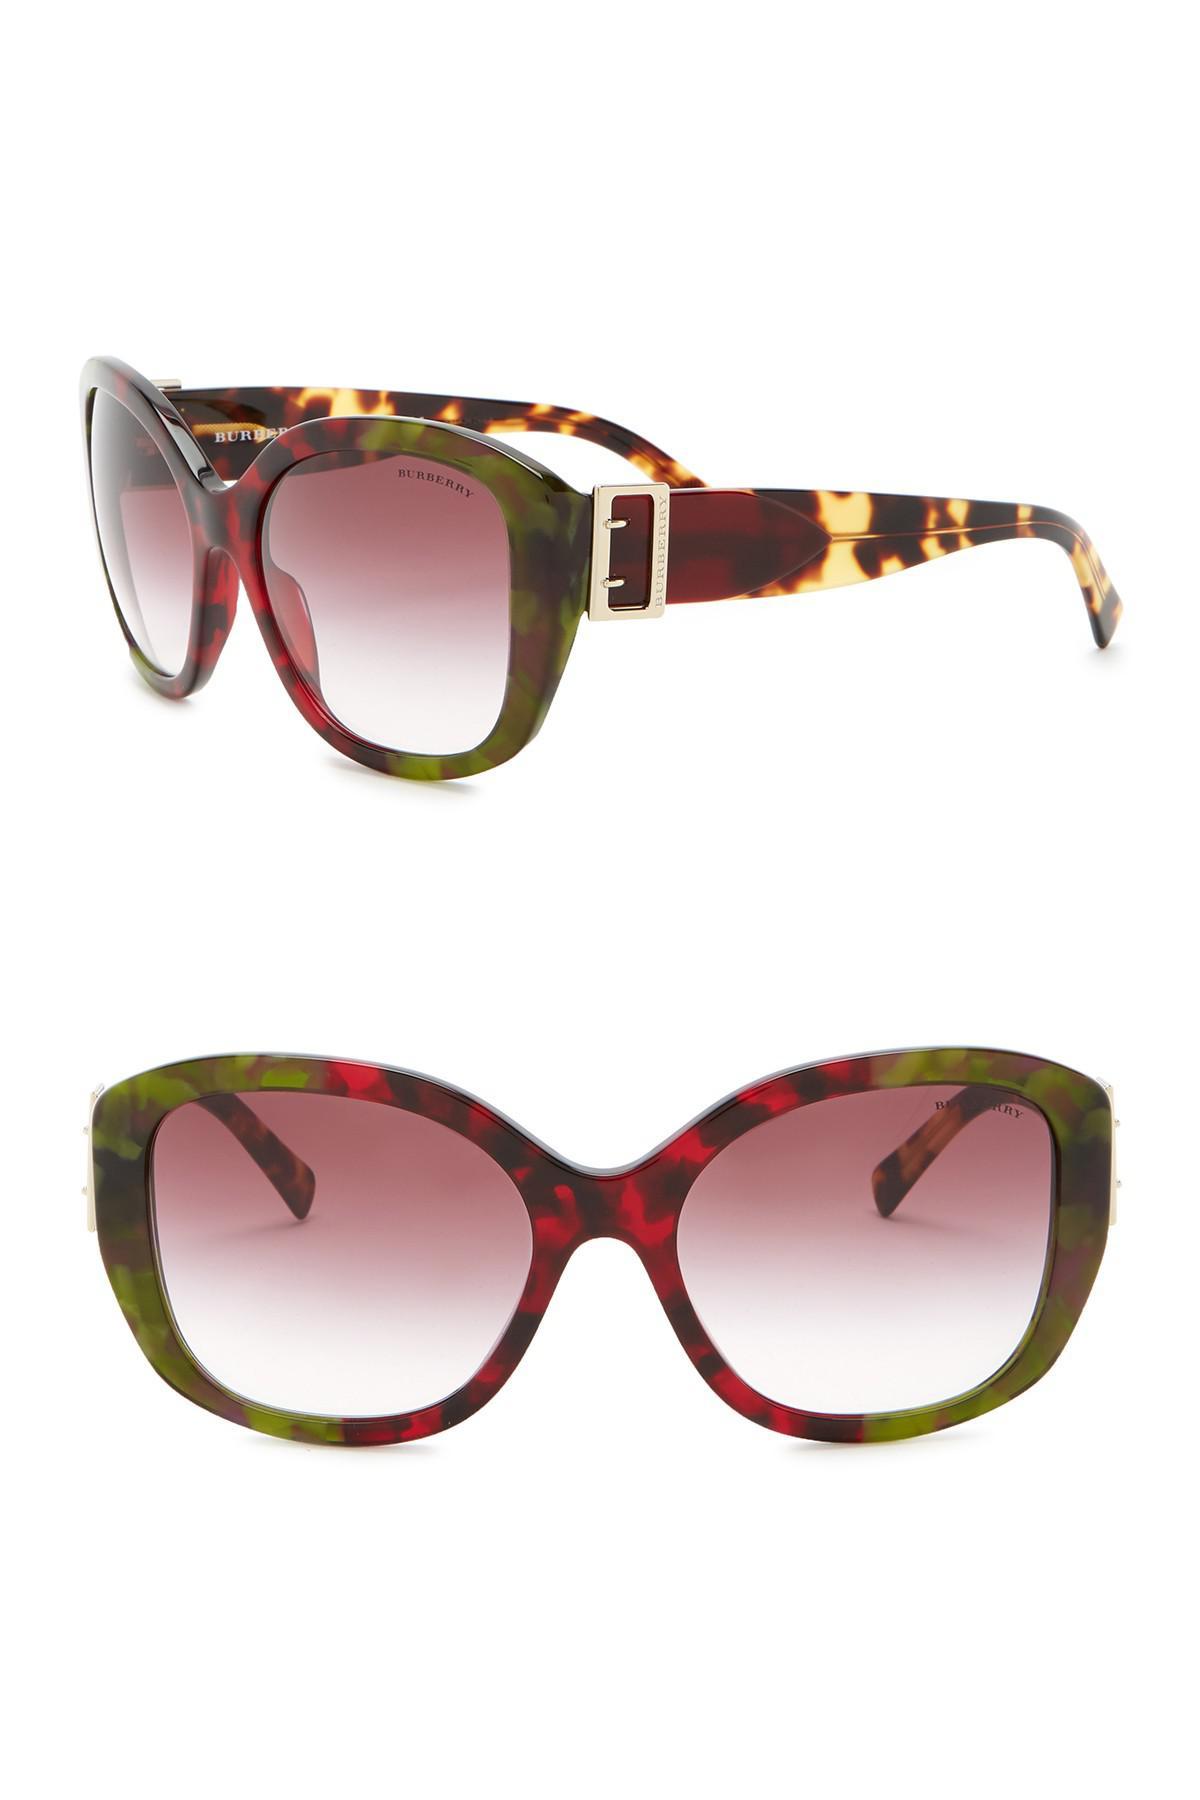 e7f3b1947b7f Lyst - Burberry 57mm Oversized Sunglasses